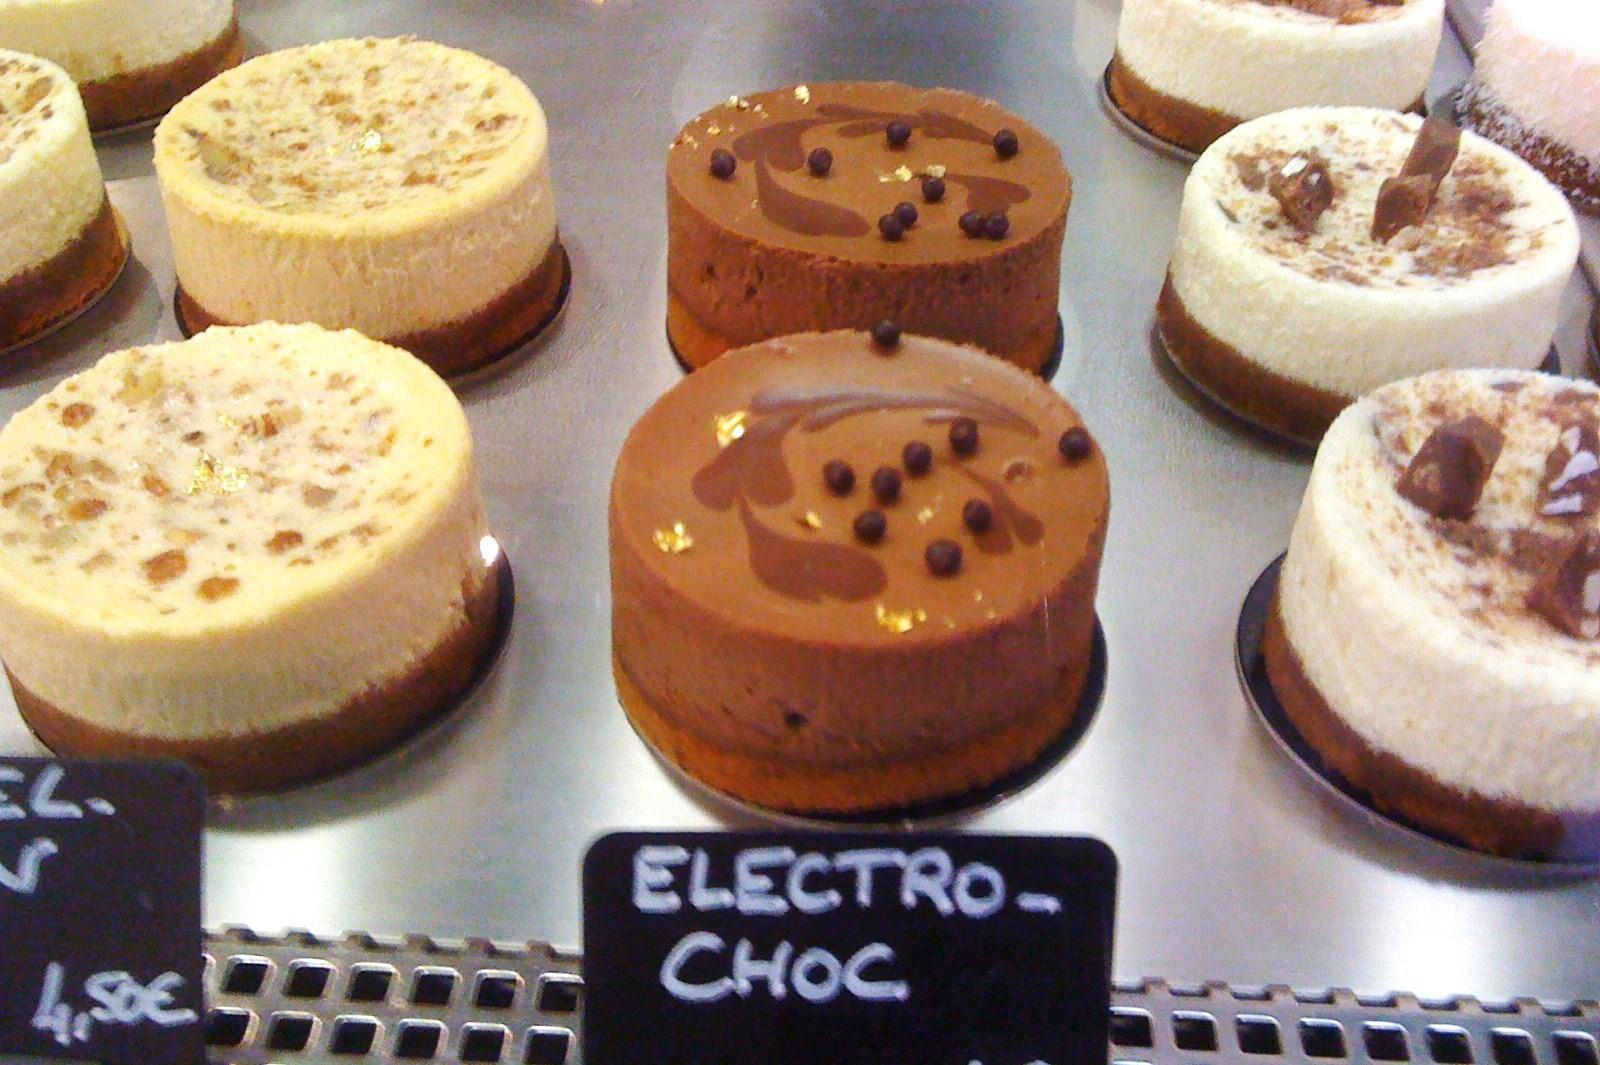 mes adresses : she's cakeséphora, le cheesecake aérien